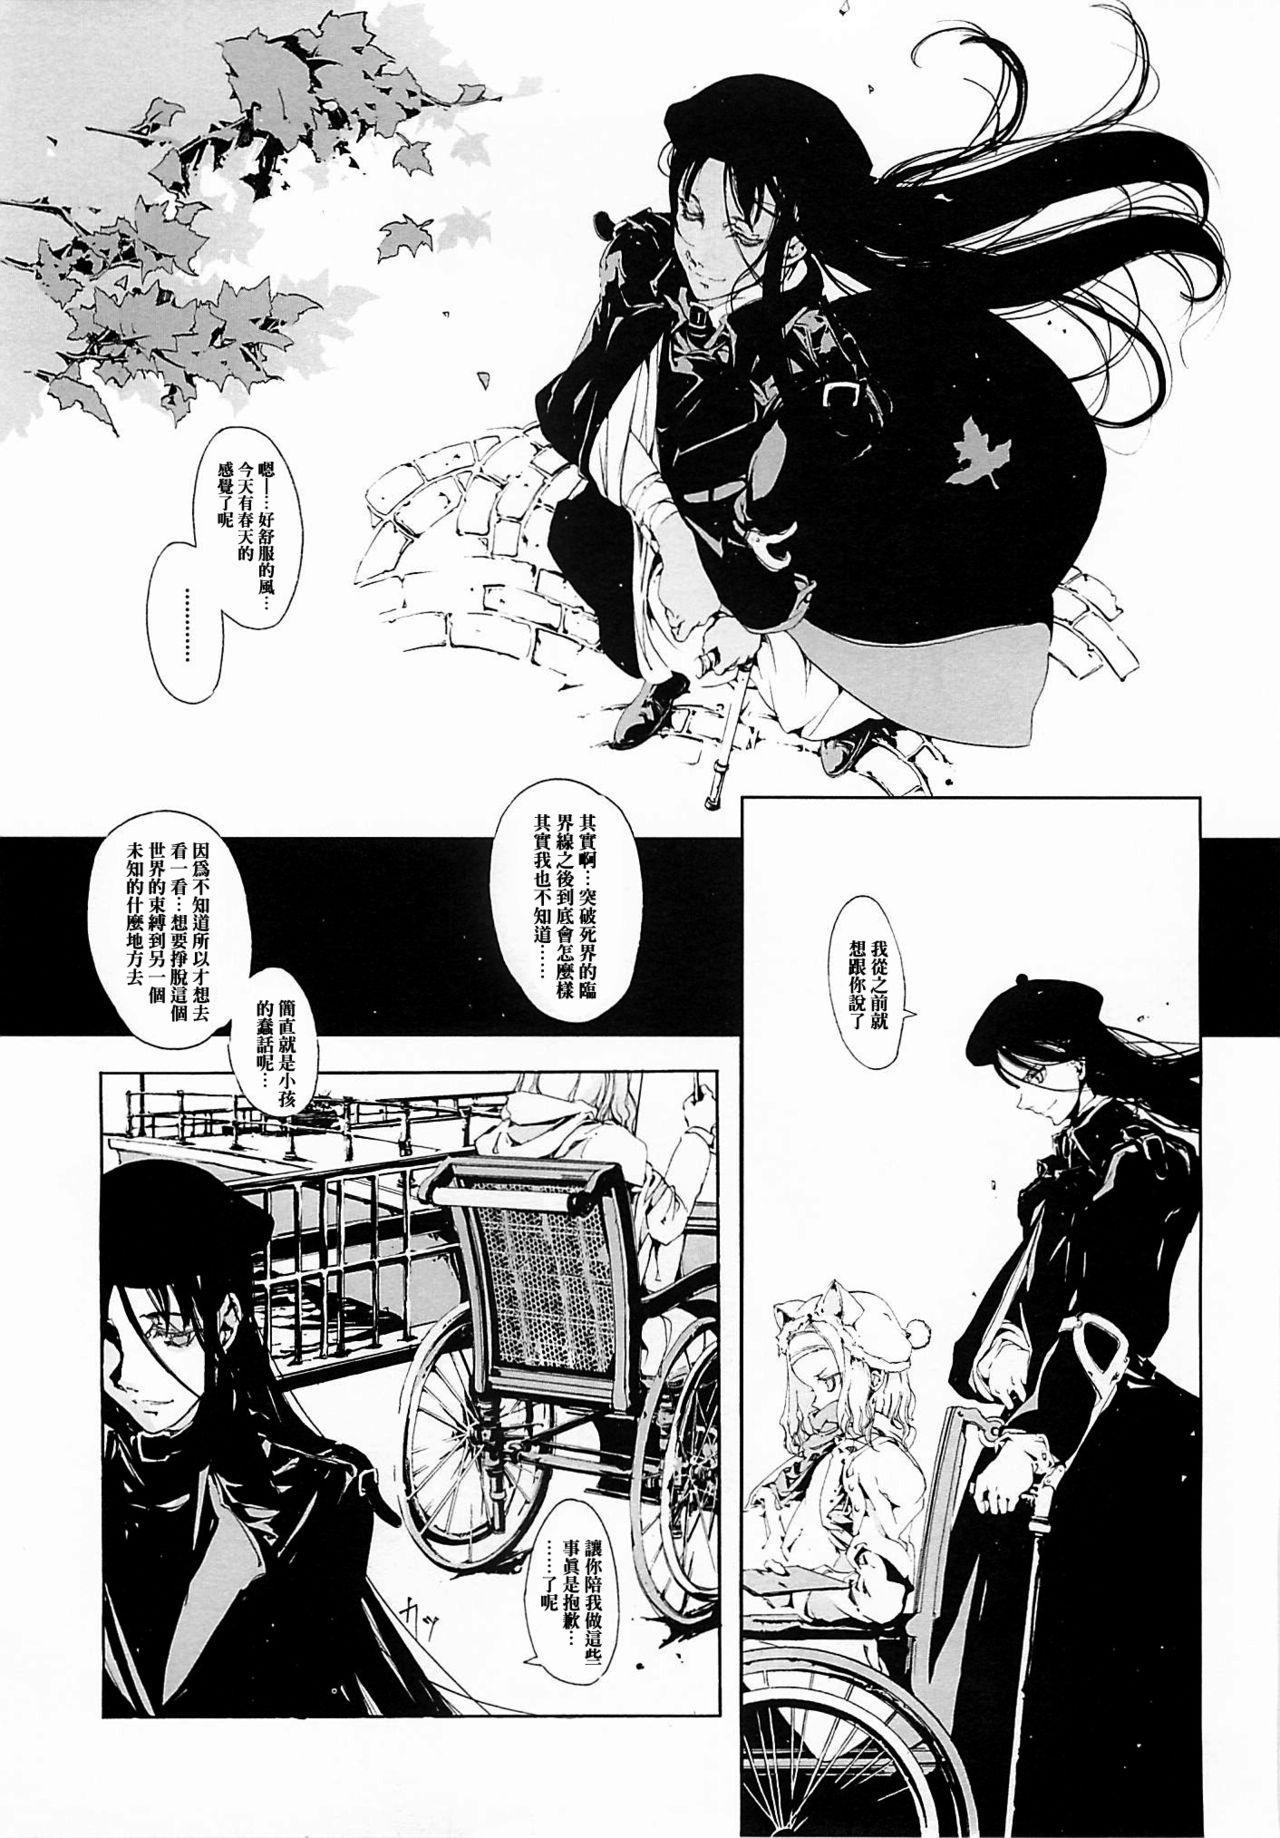 (CR37) [70 Nenshiki Yuukyuu Kikan (Endou Okito)] ORGAN-Tino  01-02[Chinese] [拾荒者汉化组] [Incomplete] 60